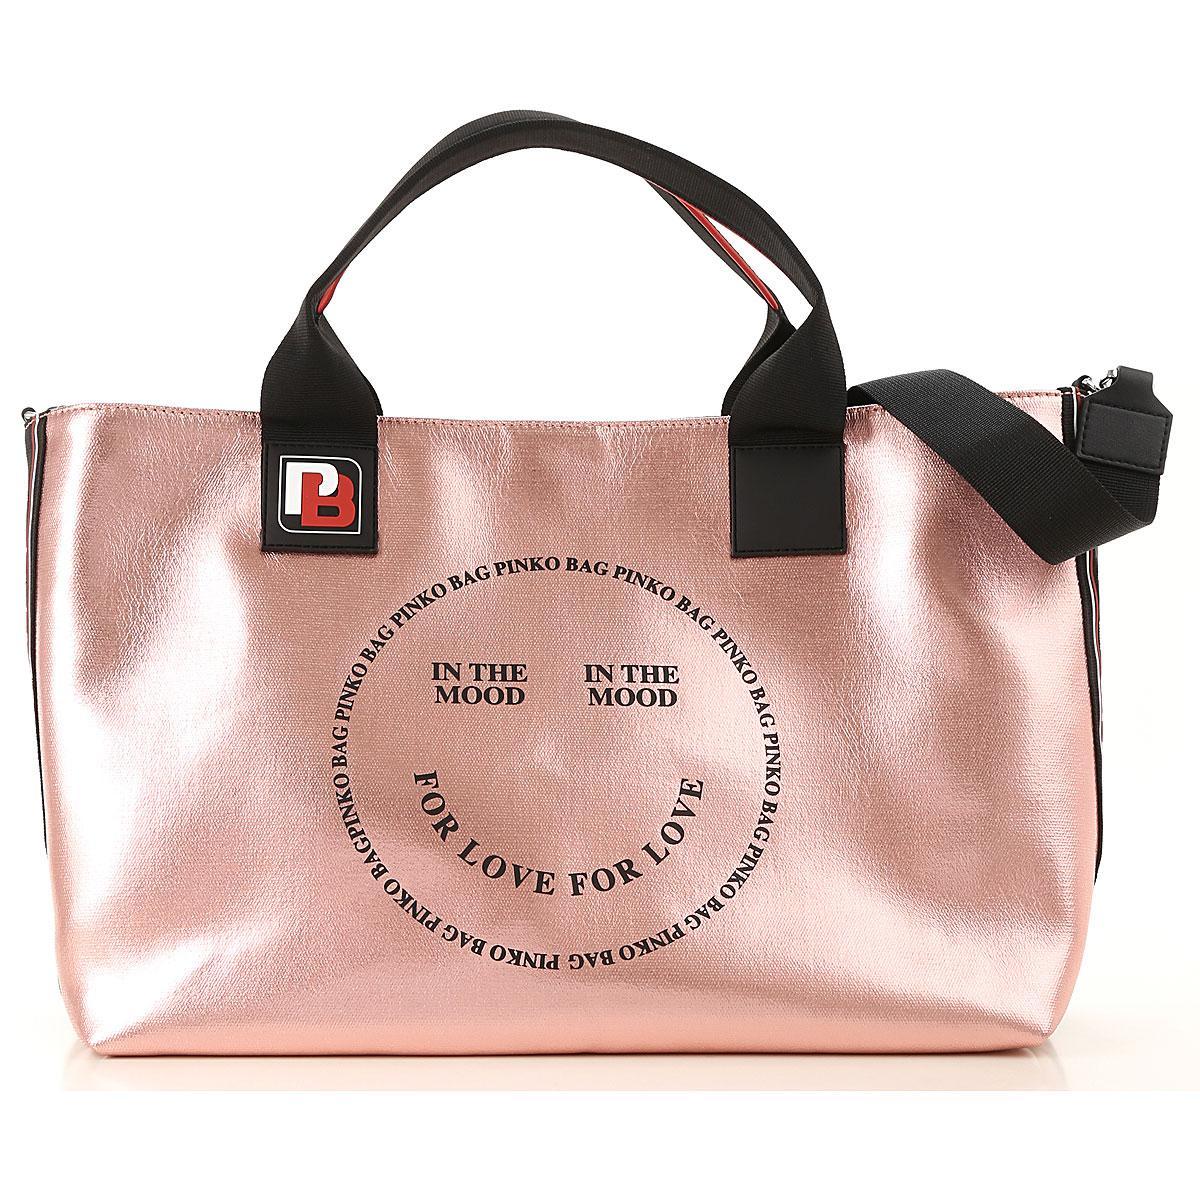 8cfa7a328fd10 Lyst - Pinko Tote Bag in Pink